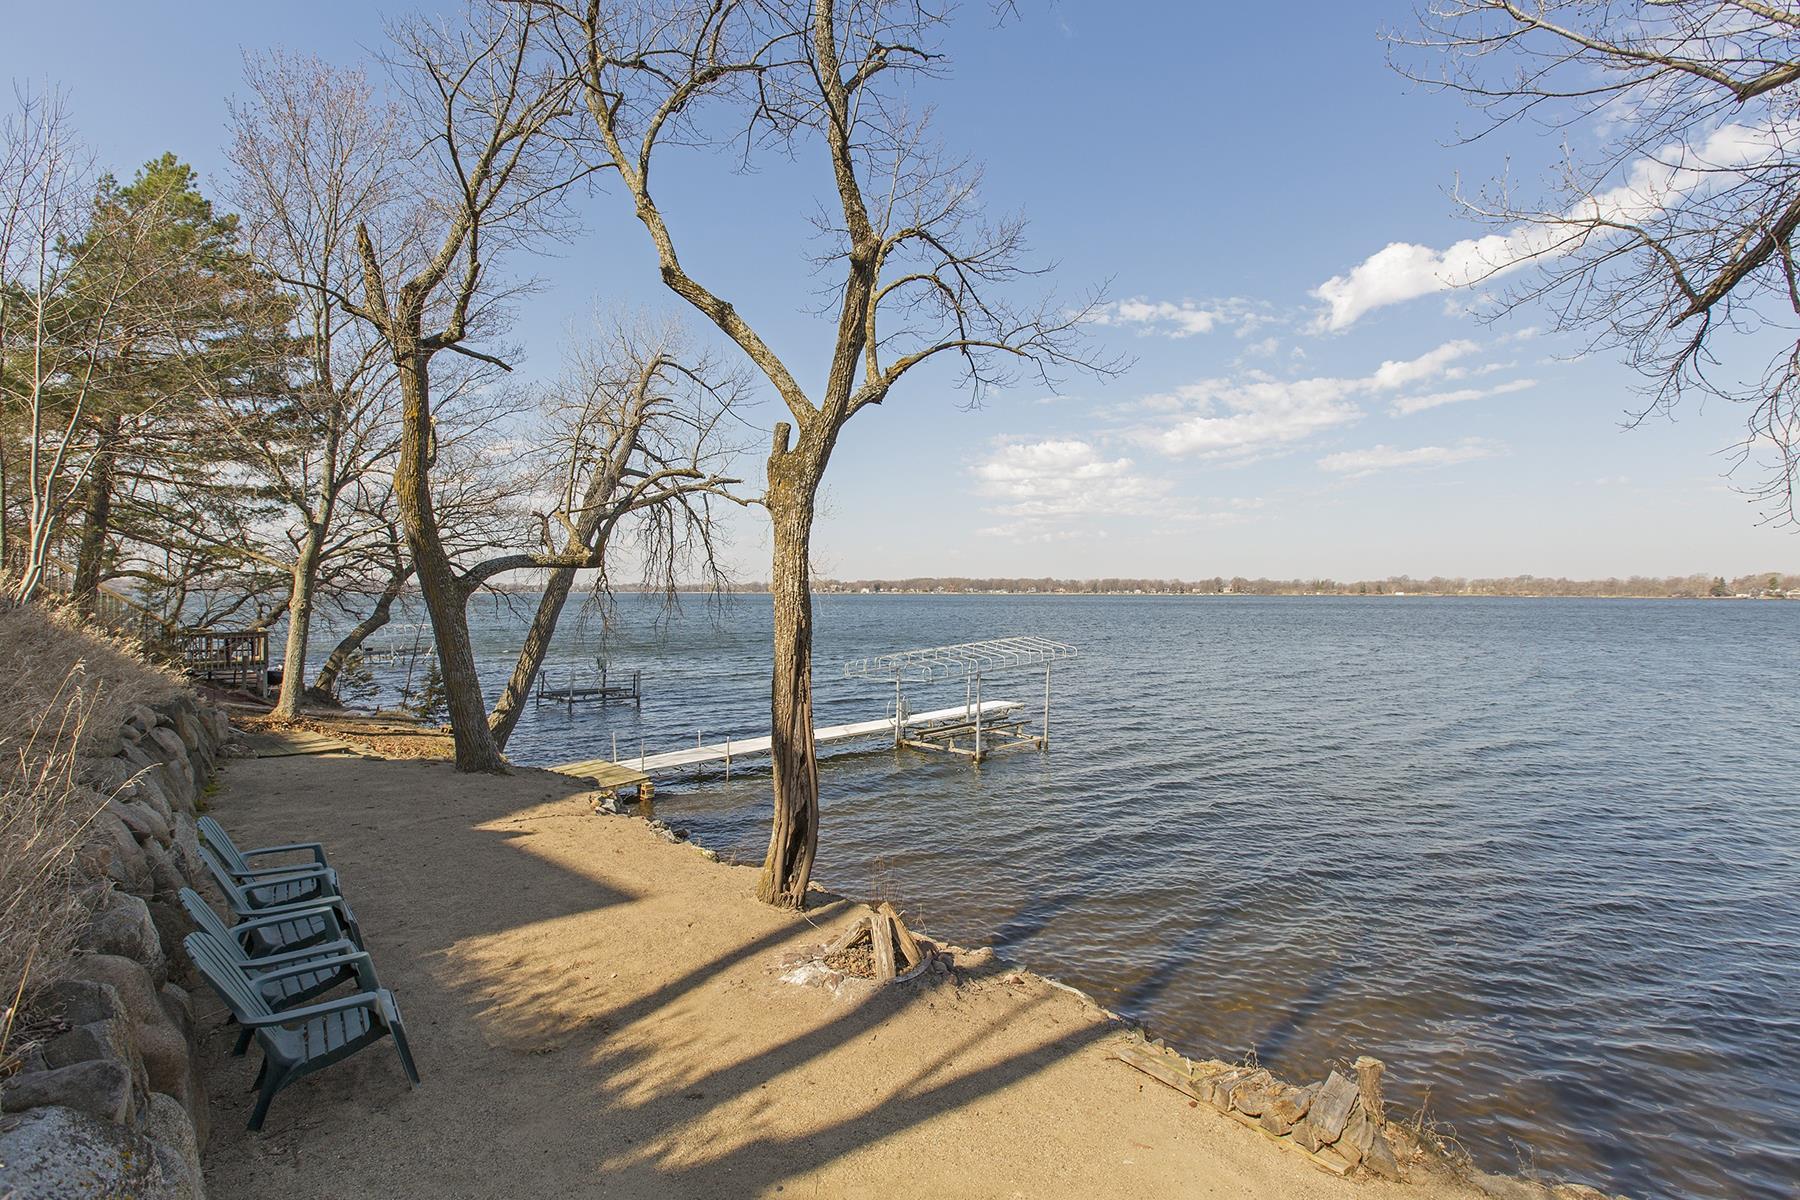 Single Family Home for Sale at 11270 Hollister Avenue Maple Lake, Minnesota, 55358 United States